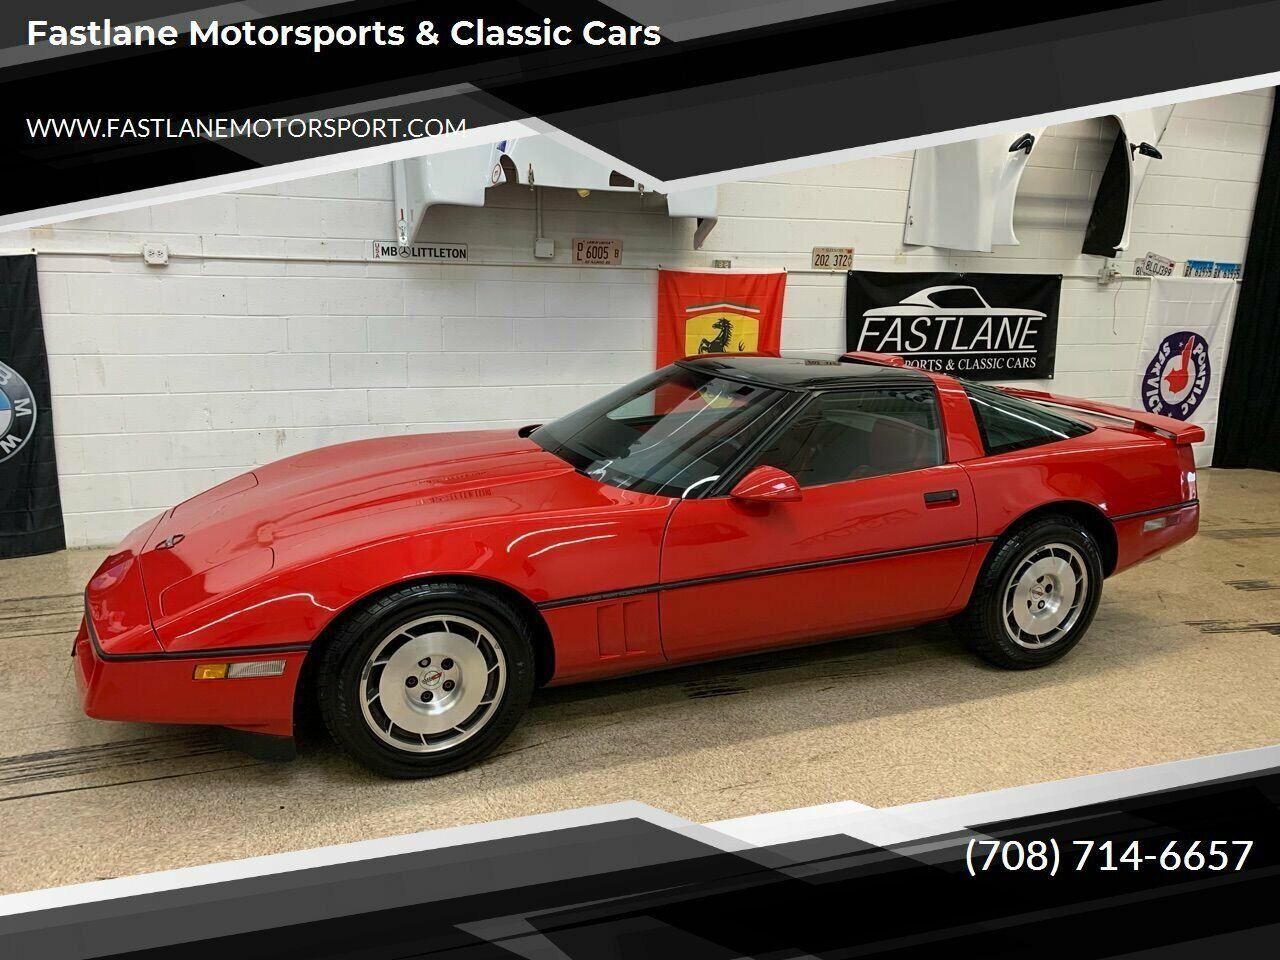 1986 Red Chevrolet Corvette   | C4 Corvette Photo 1